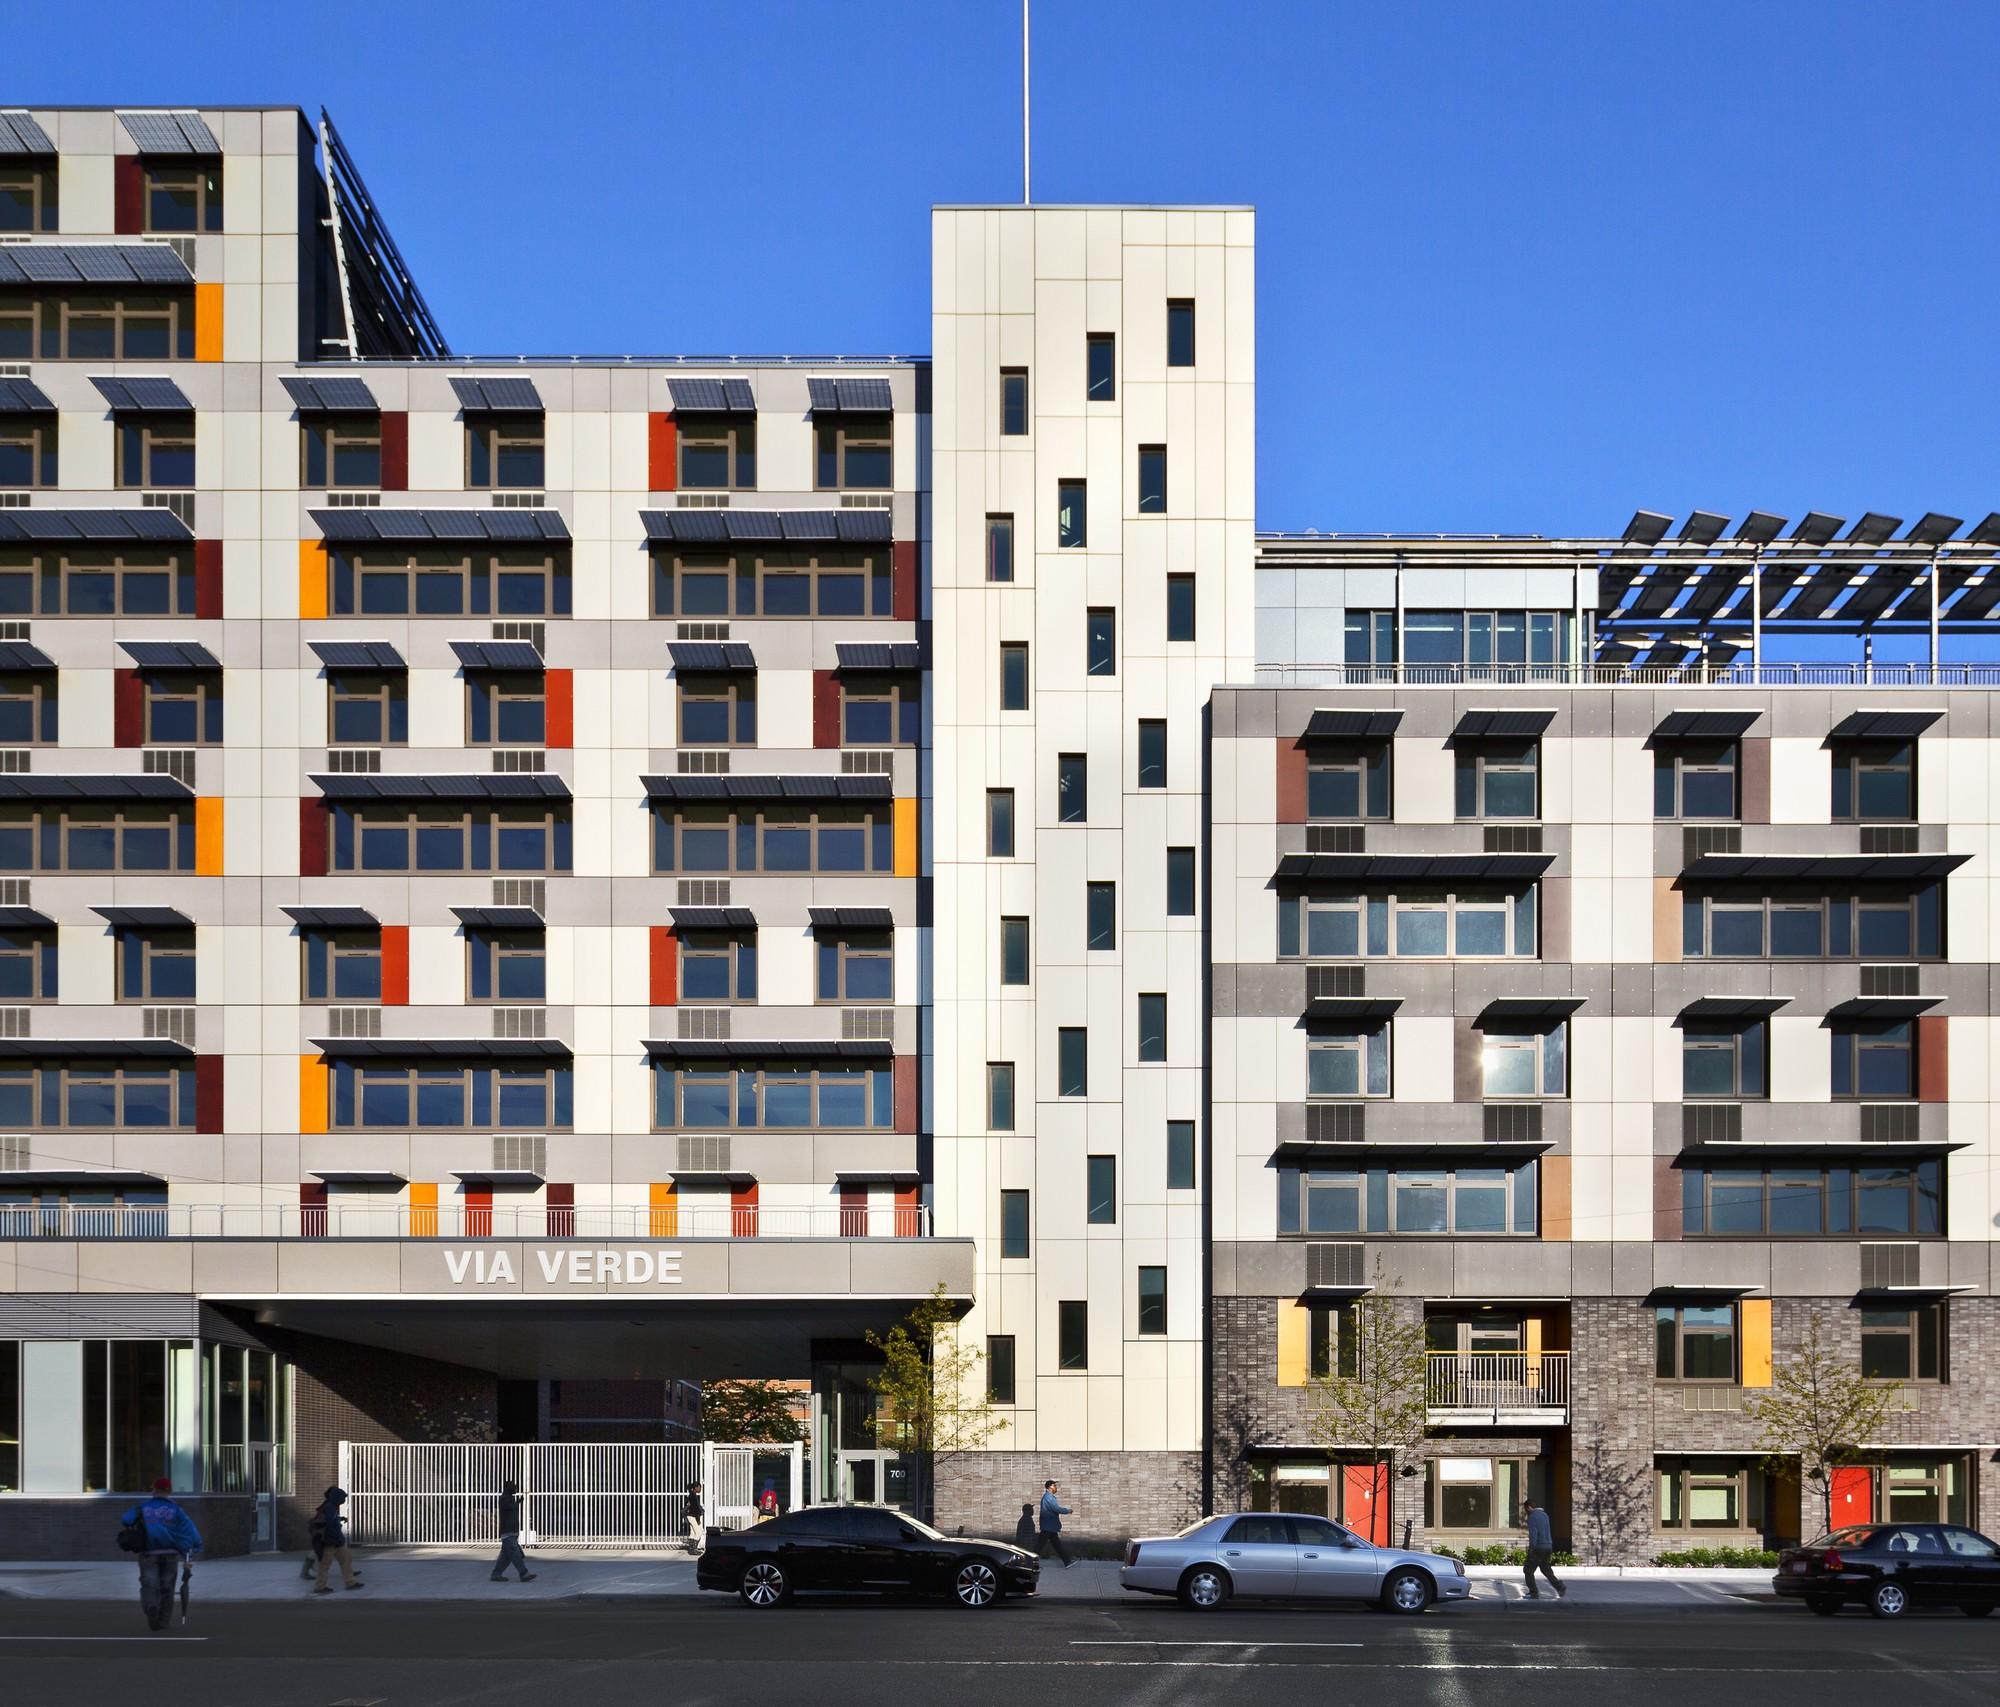 Cheap Apartments In Dc: Via Verde / Grimshaw + Dattner Architects